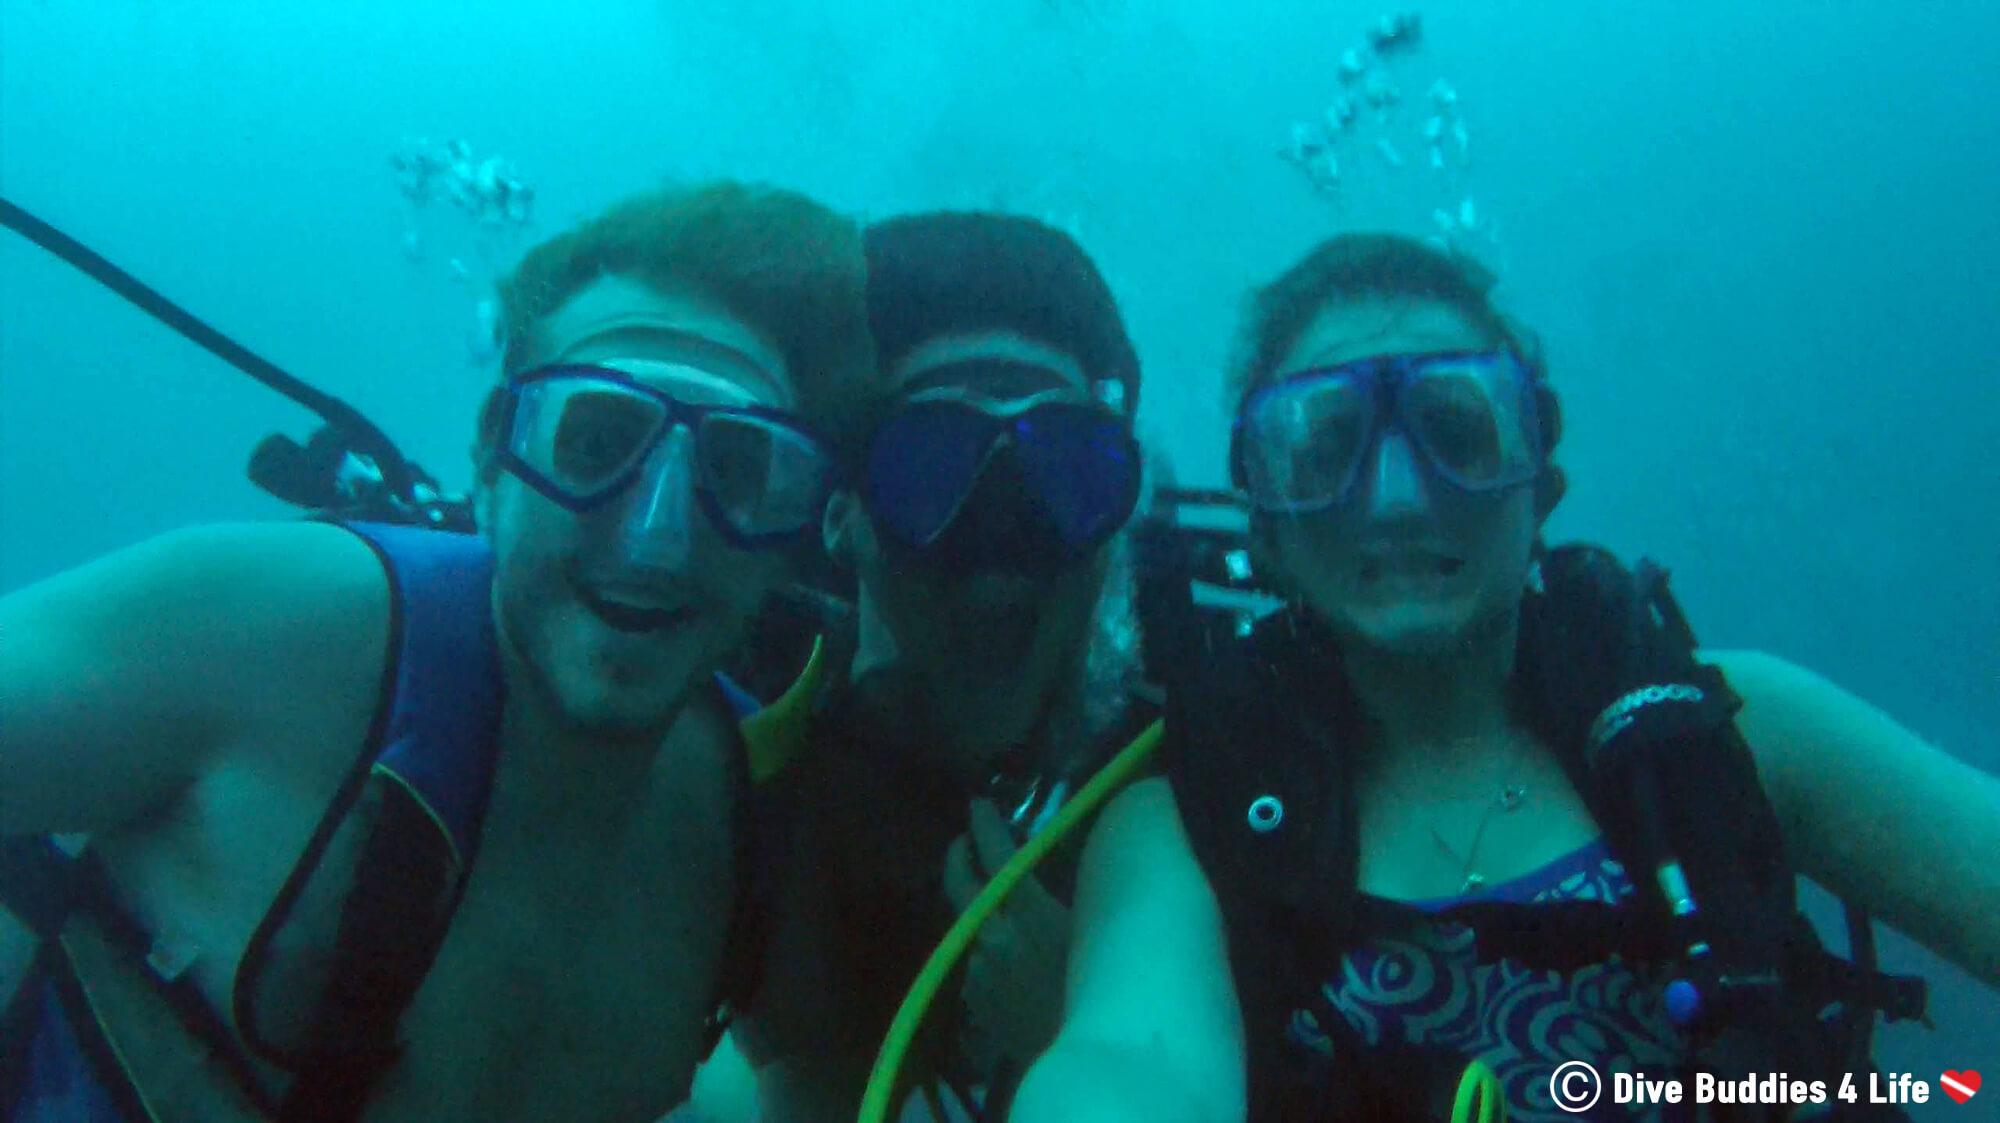 Three Scuba Divers Underwater In A Volcanic Crater In Laguna Apoyo, Nicaragua